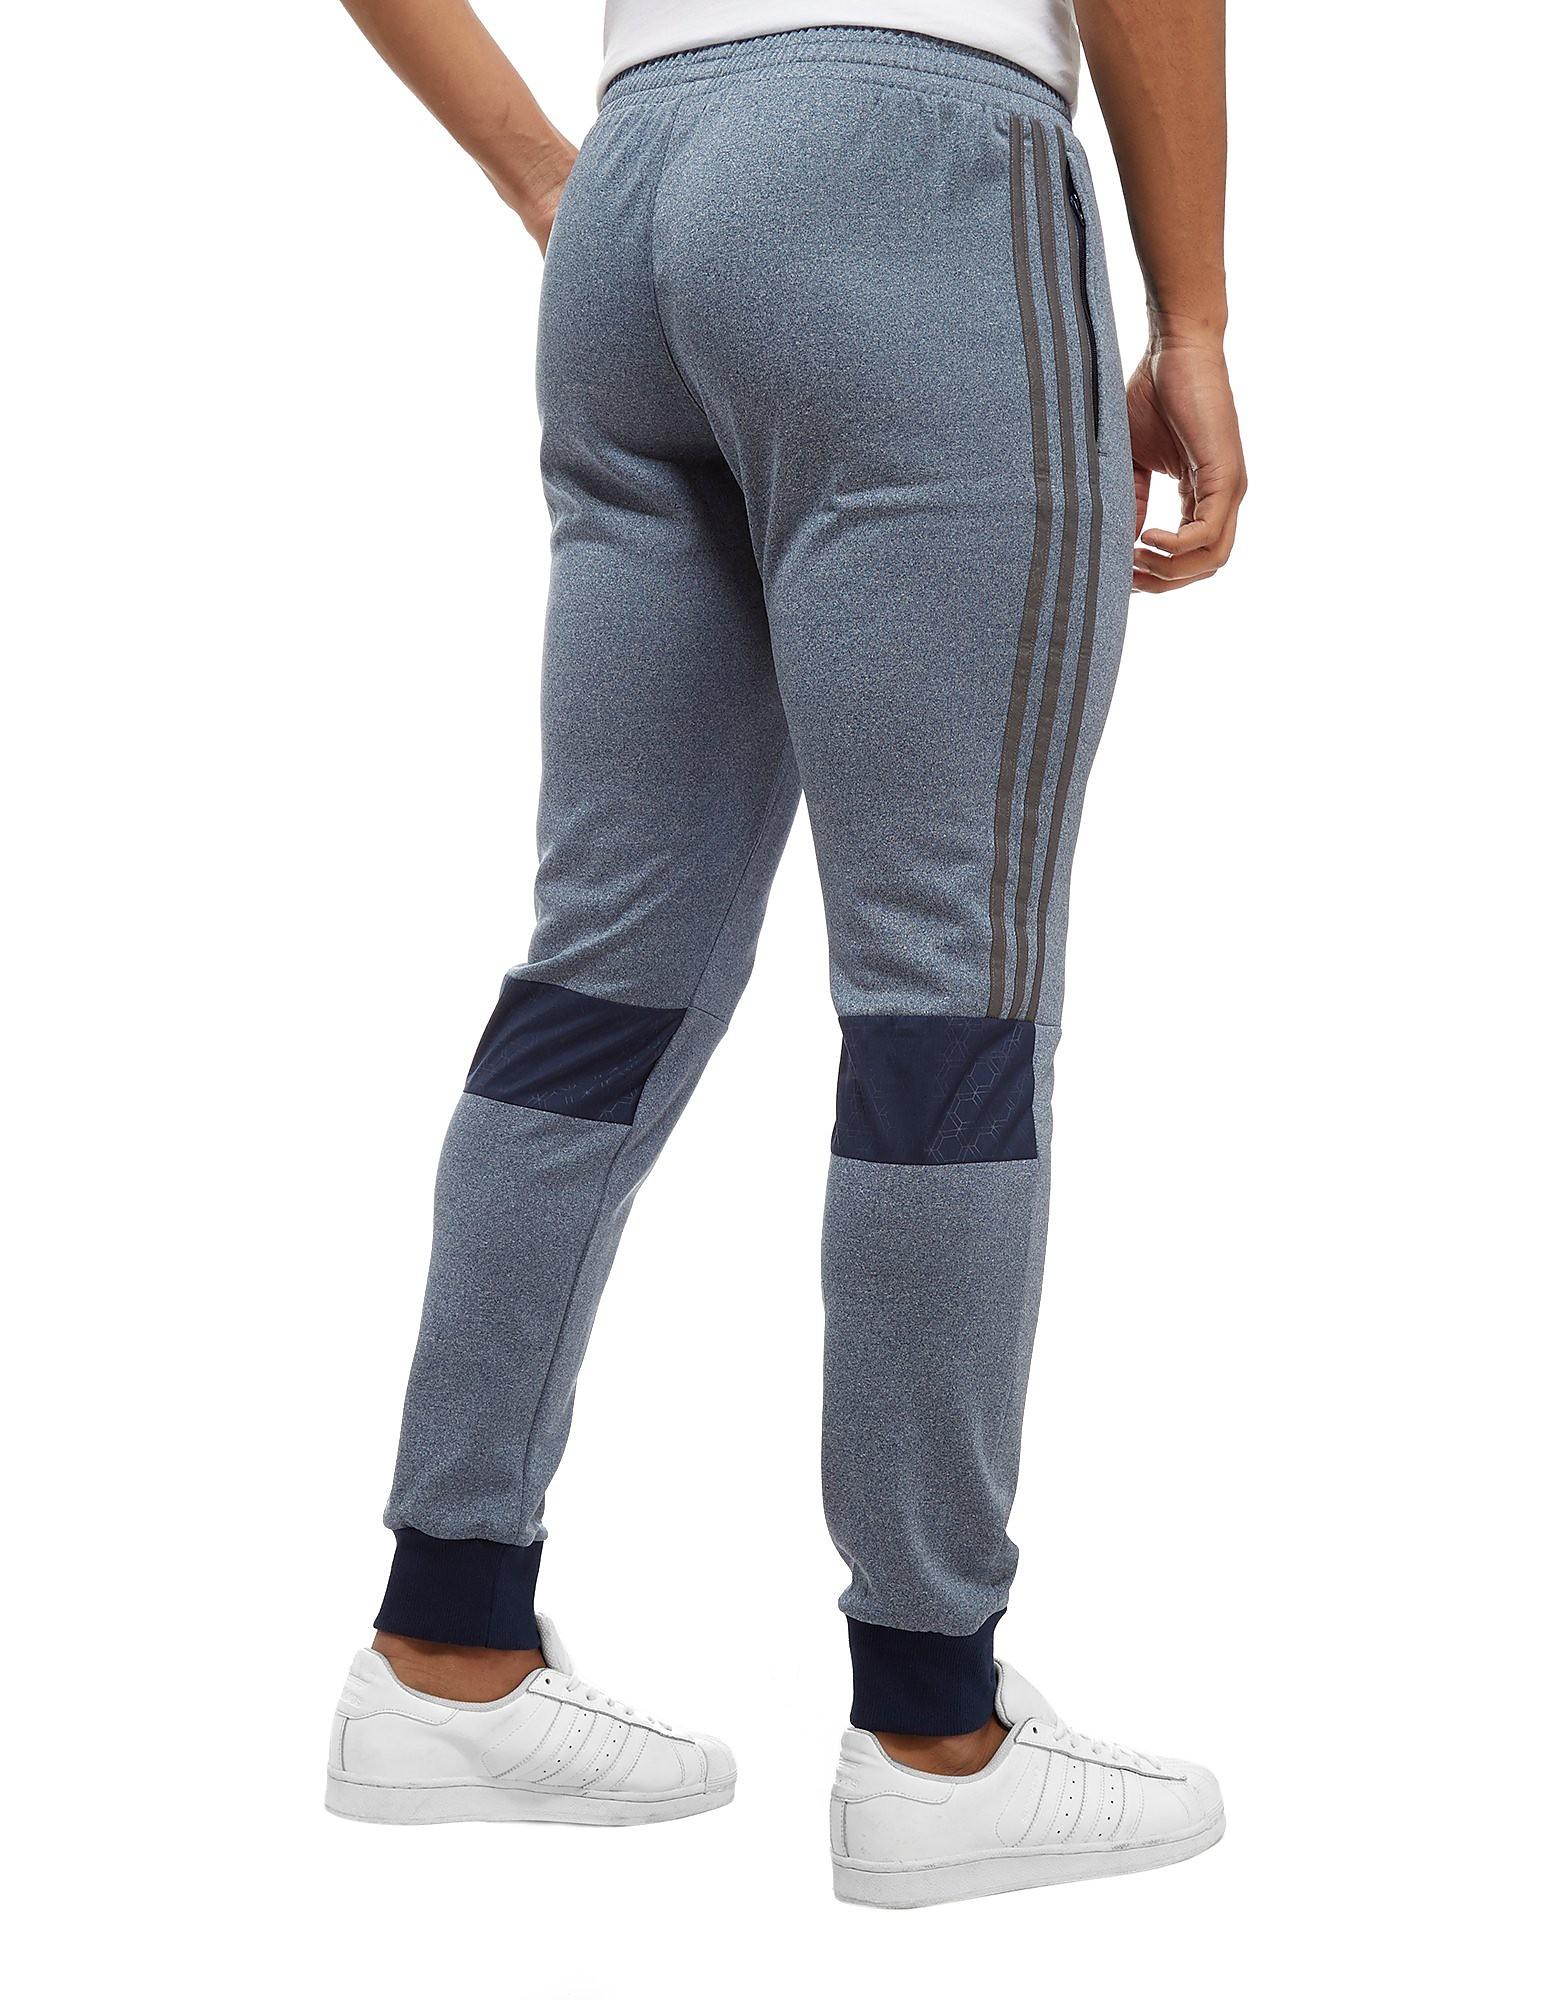 adidas Originals NMD Pants